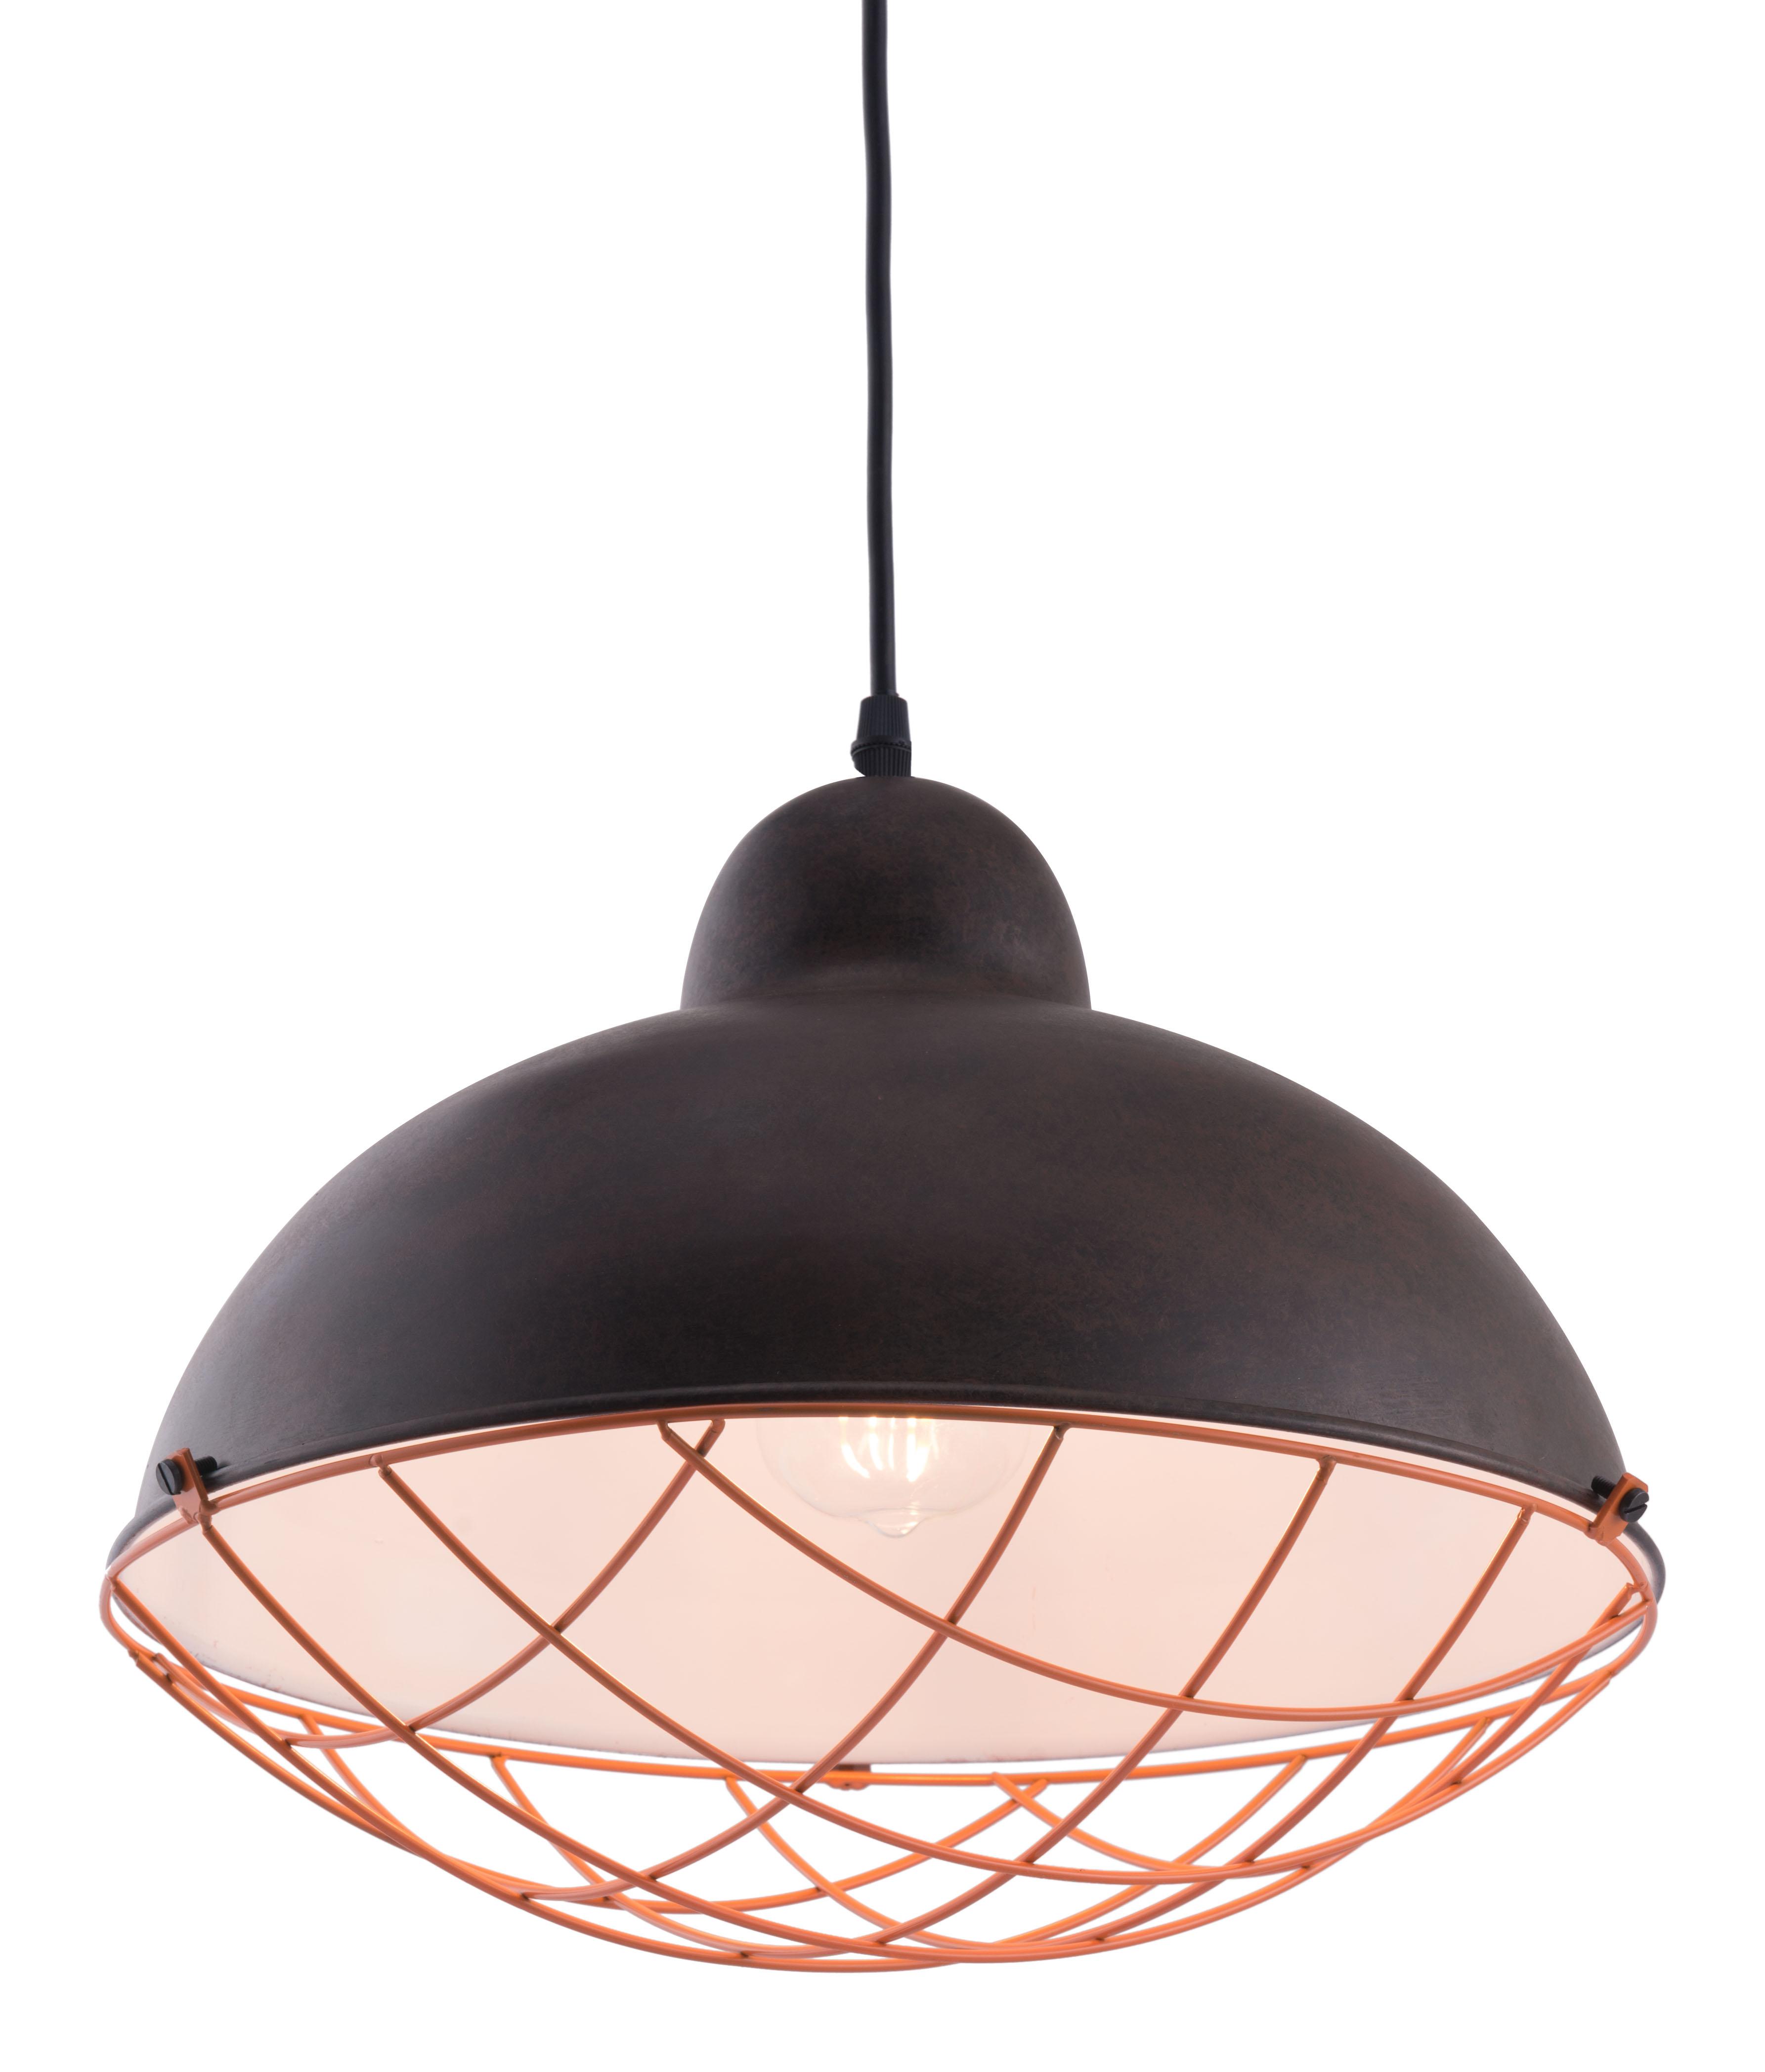 zuo-kong-ceiling-lamp-distressed-black.jpg